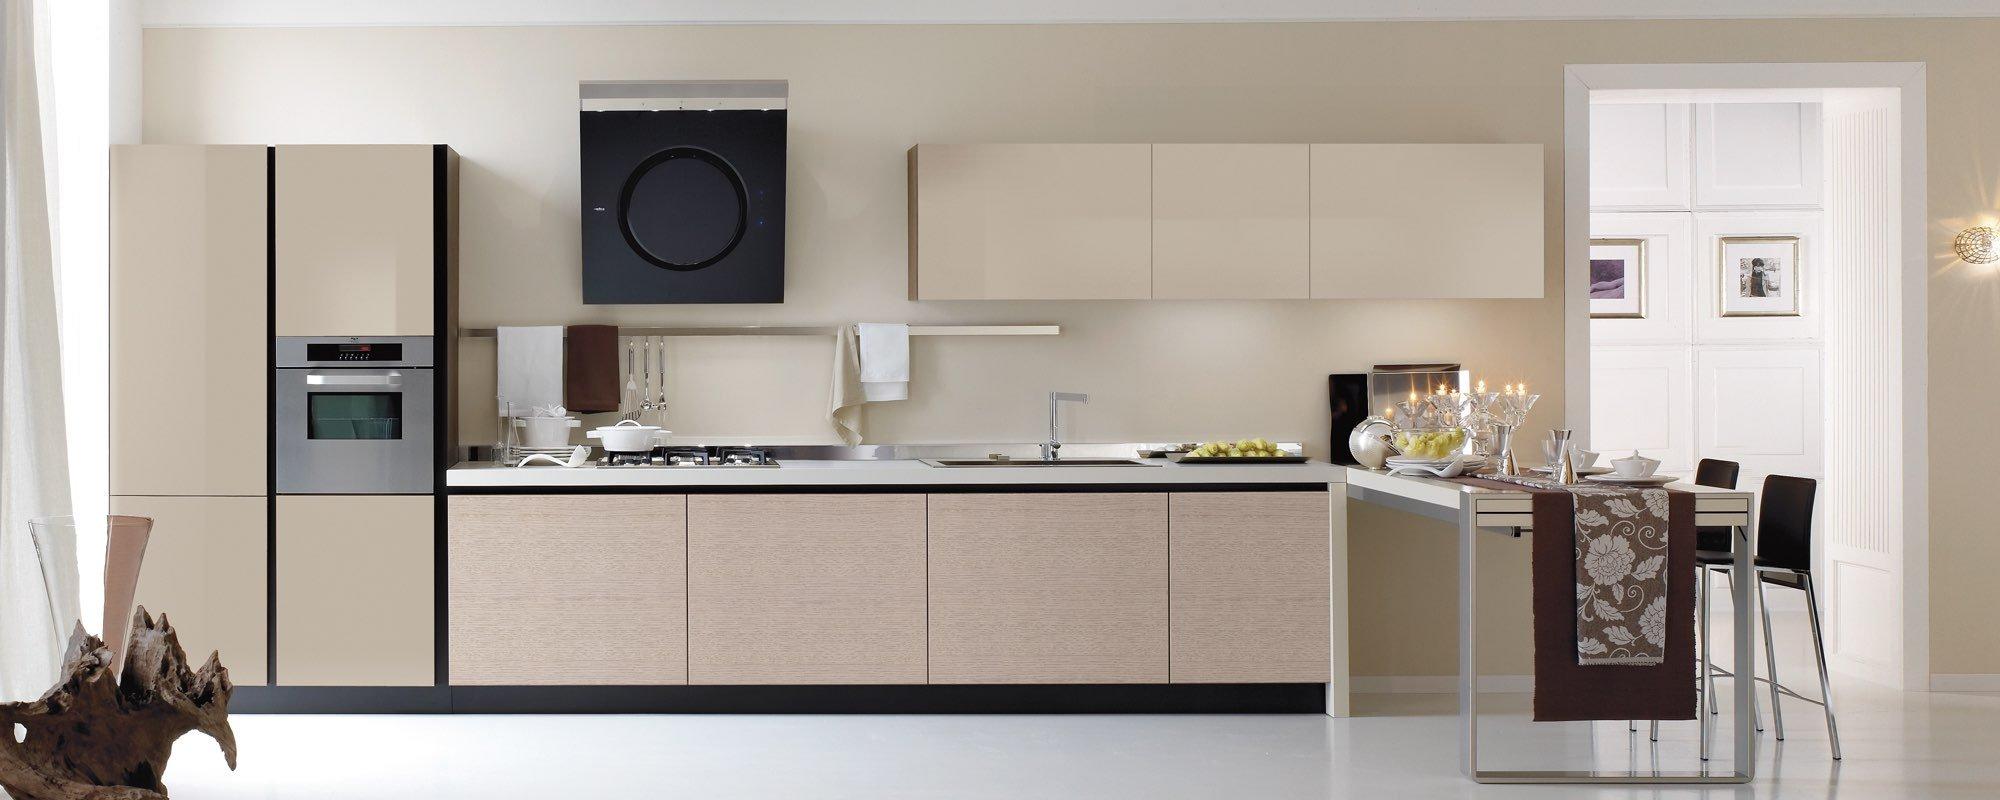 vista frontale di una cucina moderna con arredamento-Life